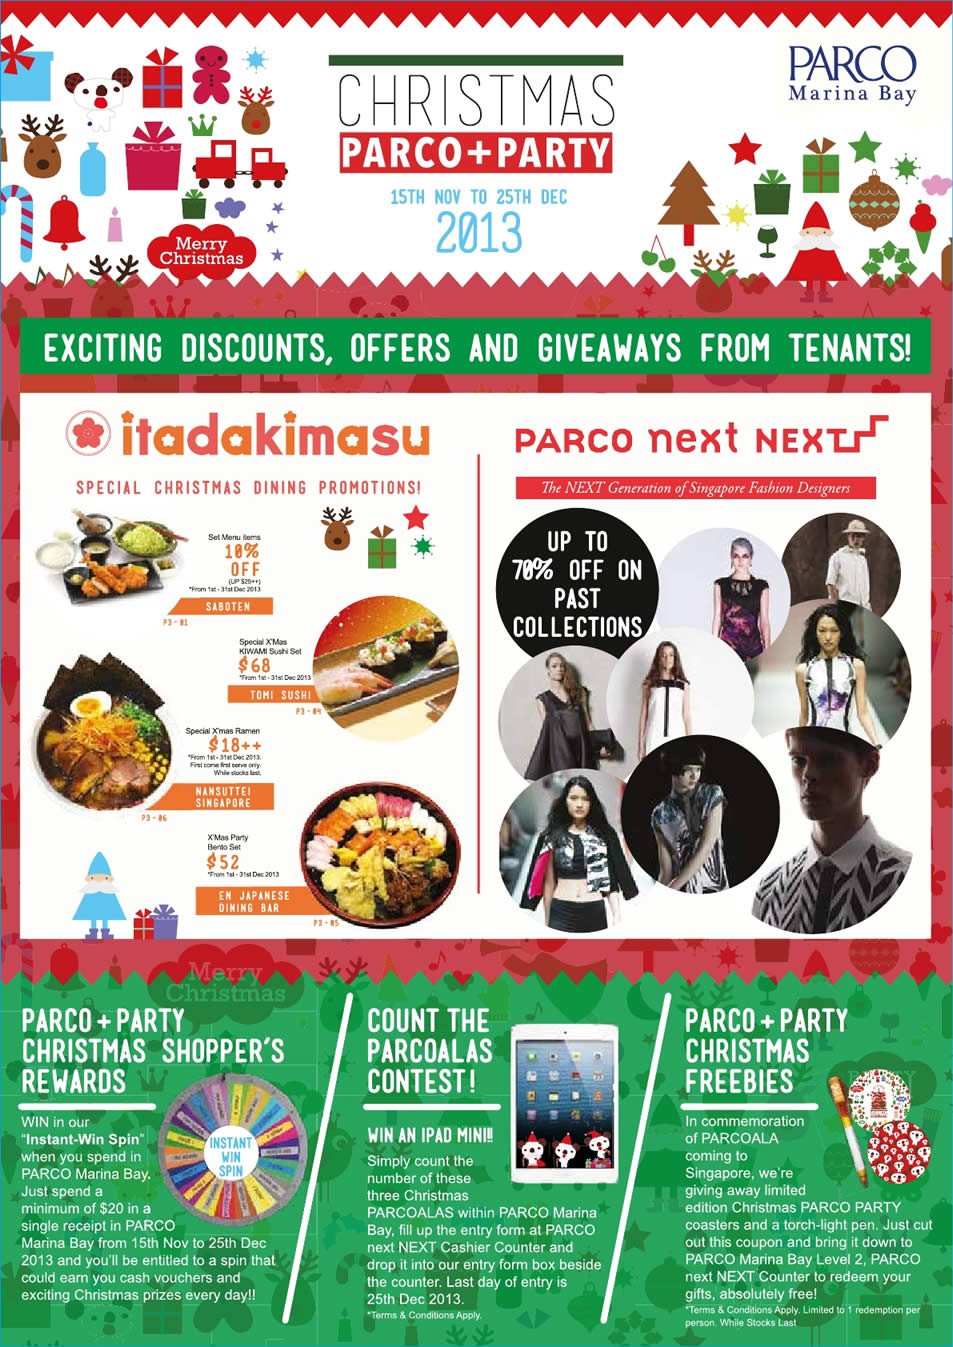 Shoppers Rewards, Count Contest, Christmas Freebies, Parco Next Next, Itadakimasu